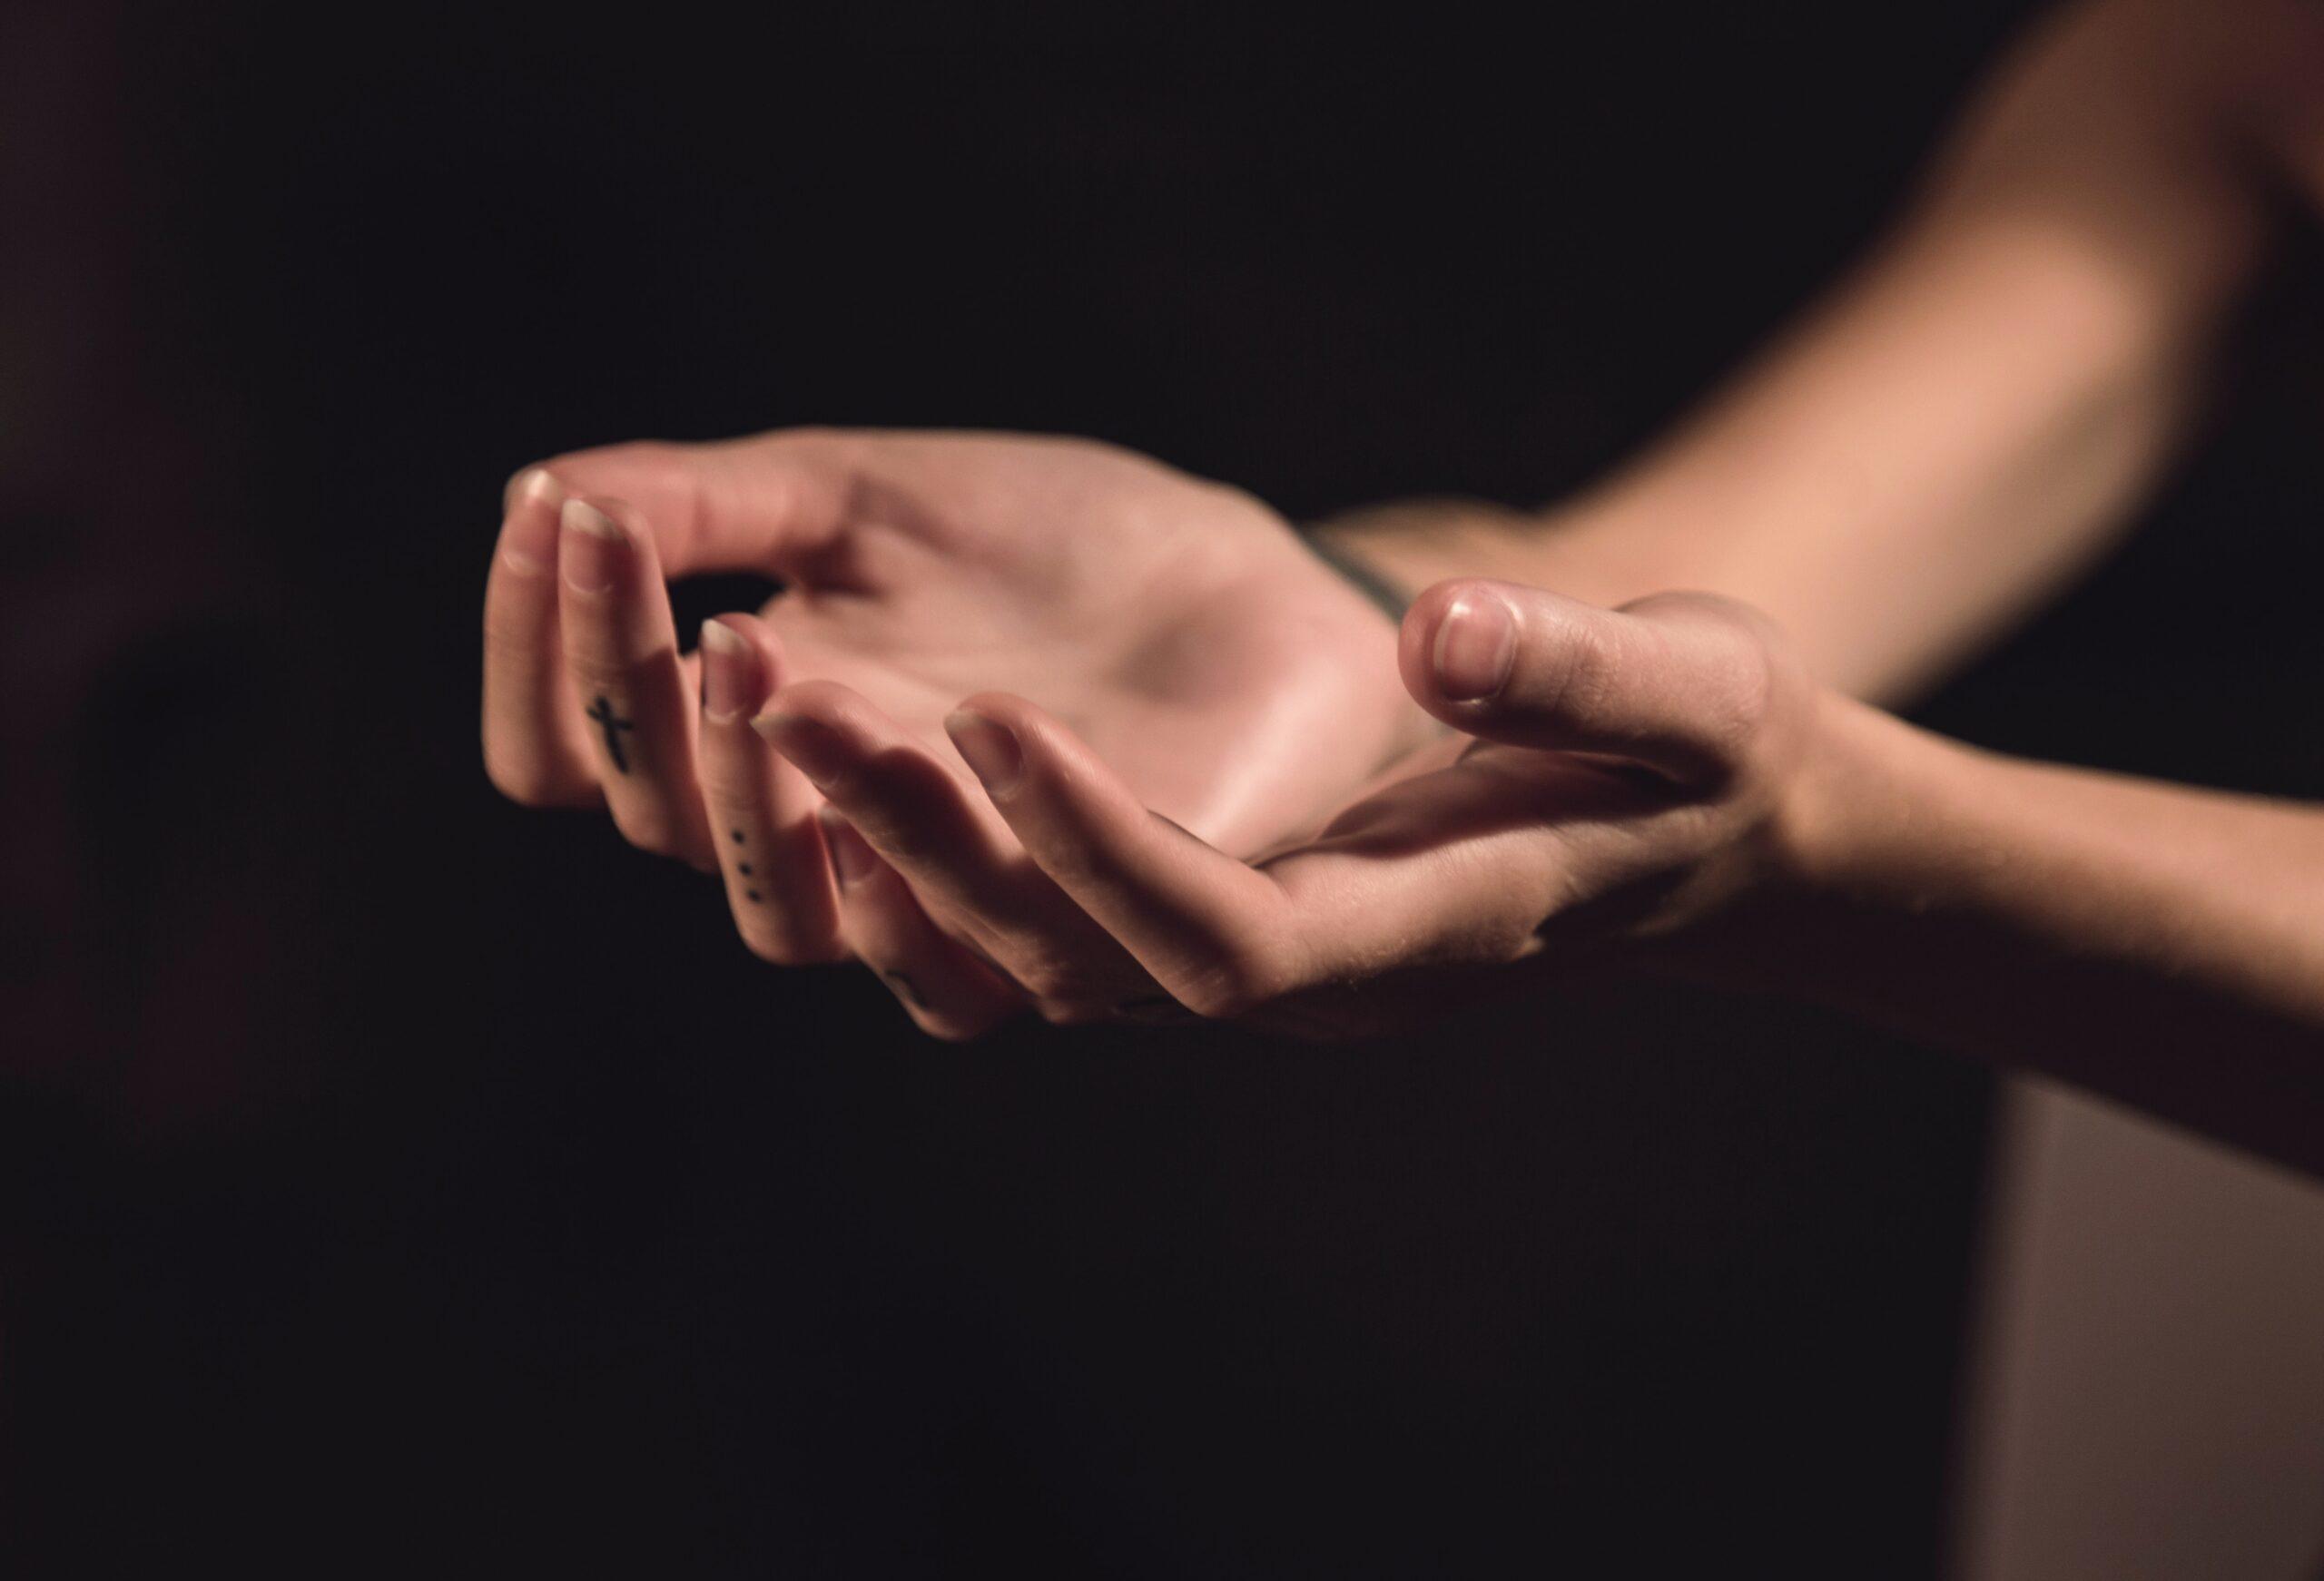 Woman's hands, palms up